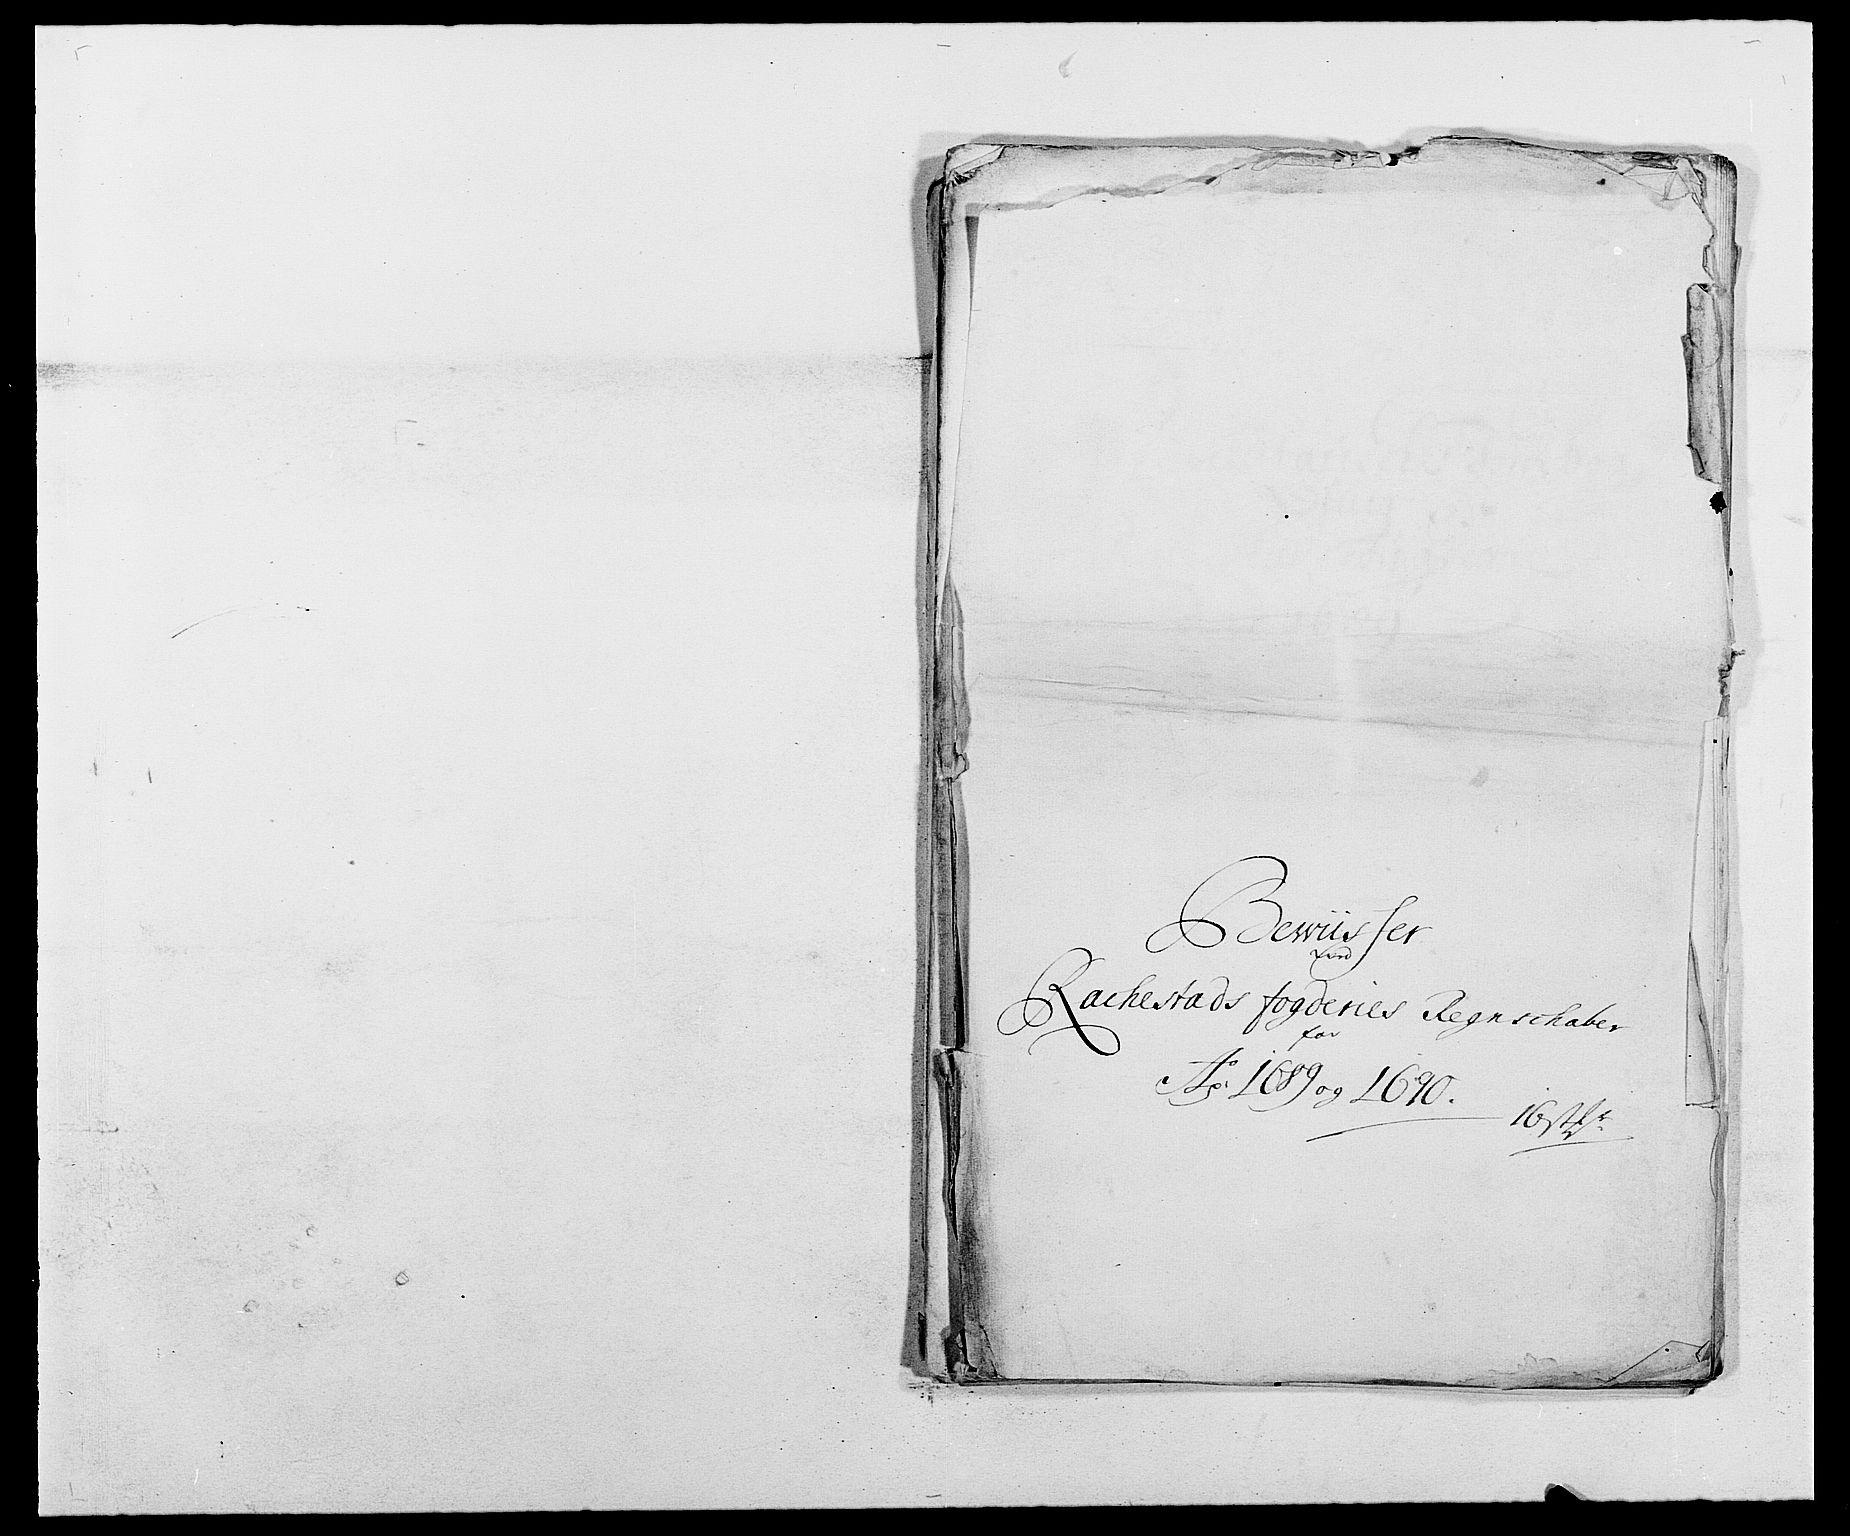 RA, Rentekammeret inntil 1814, Reviderte regnskaper, Fogderegnskap, R05/L0277: Fogderegnskap Rakkestad, 1689-1690, s. 319